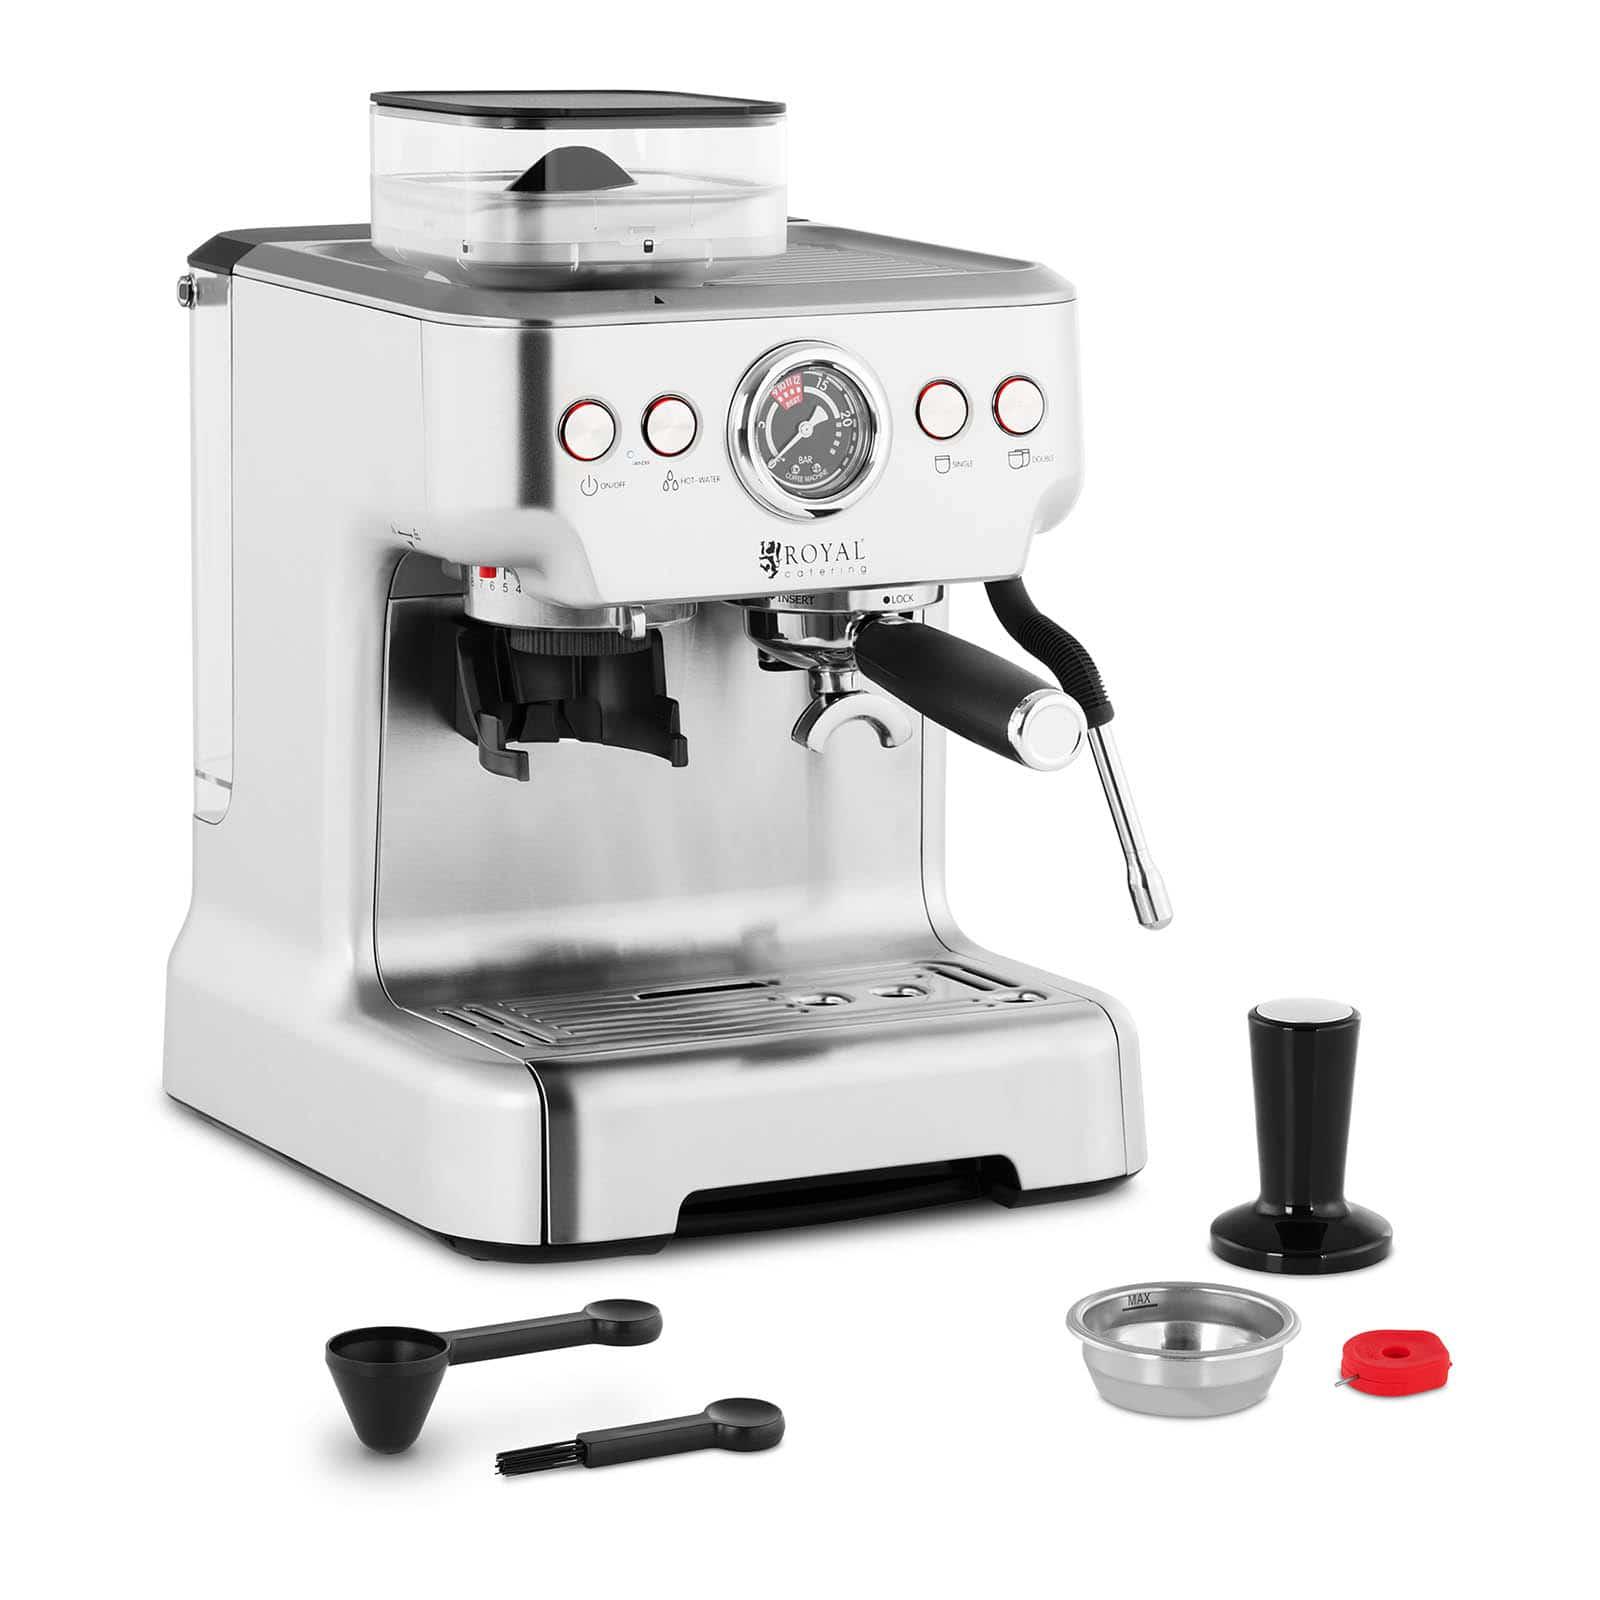 Machine a cafe pro